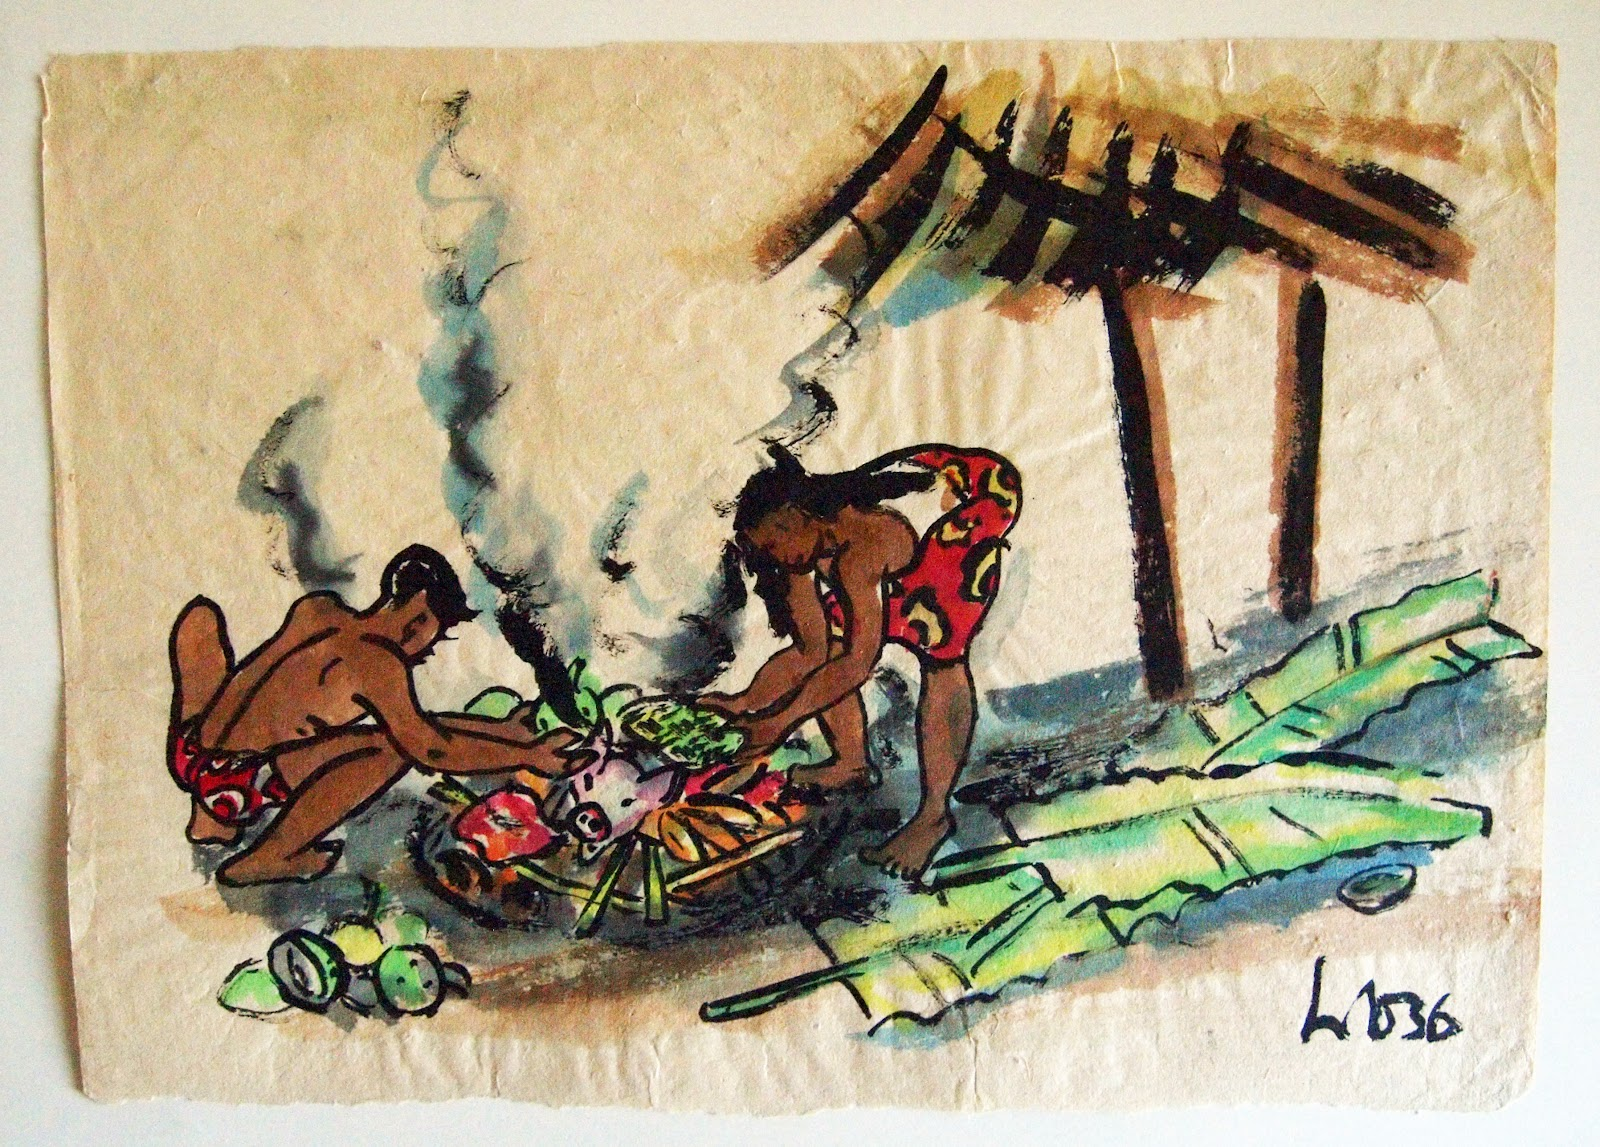 Preparing the Imu, watercolor, 1936, family-owned